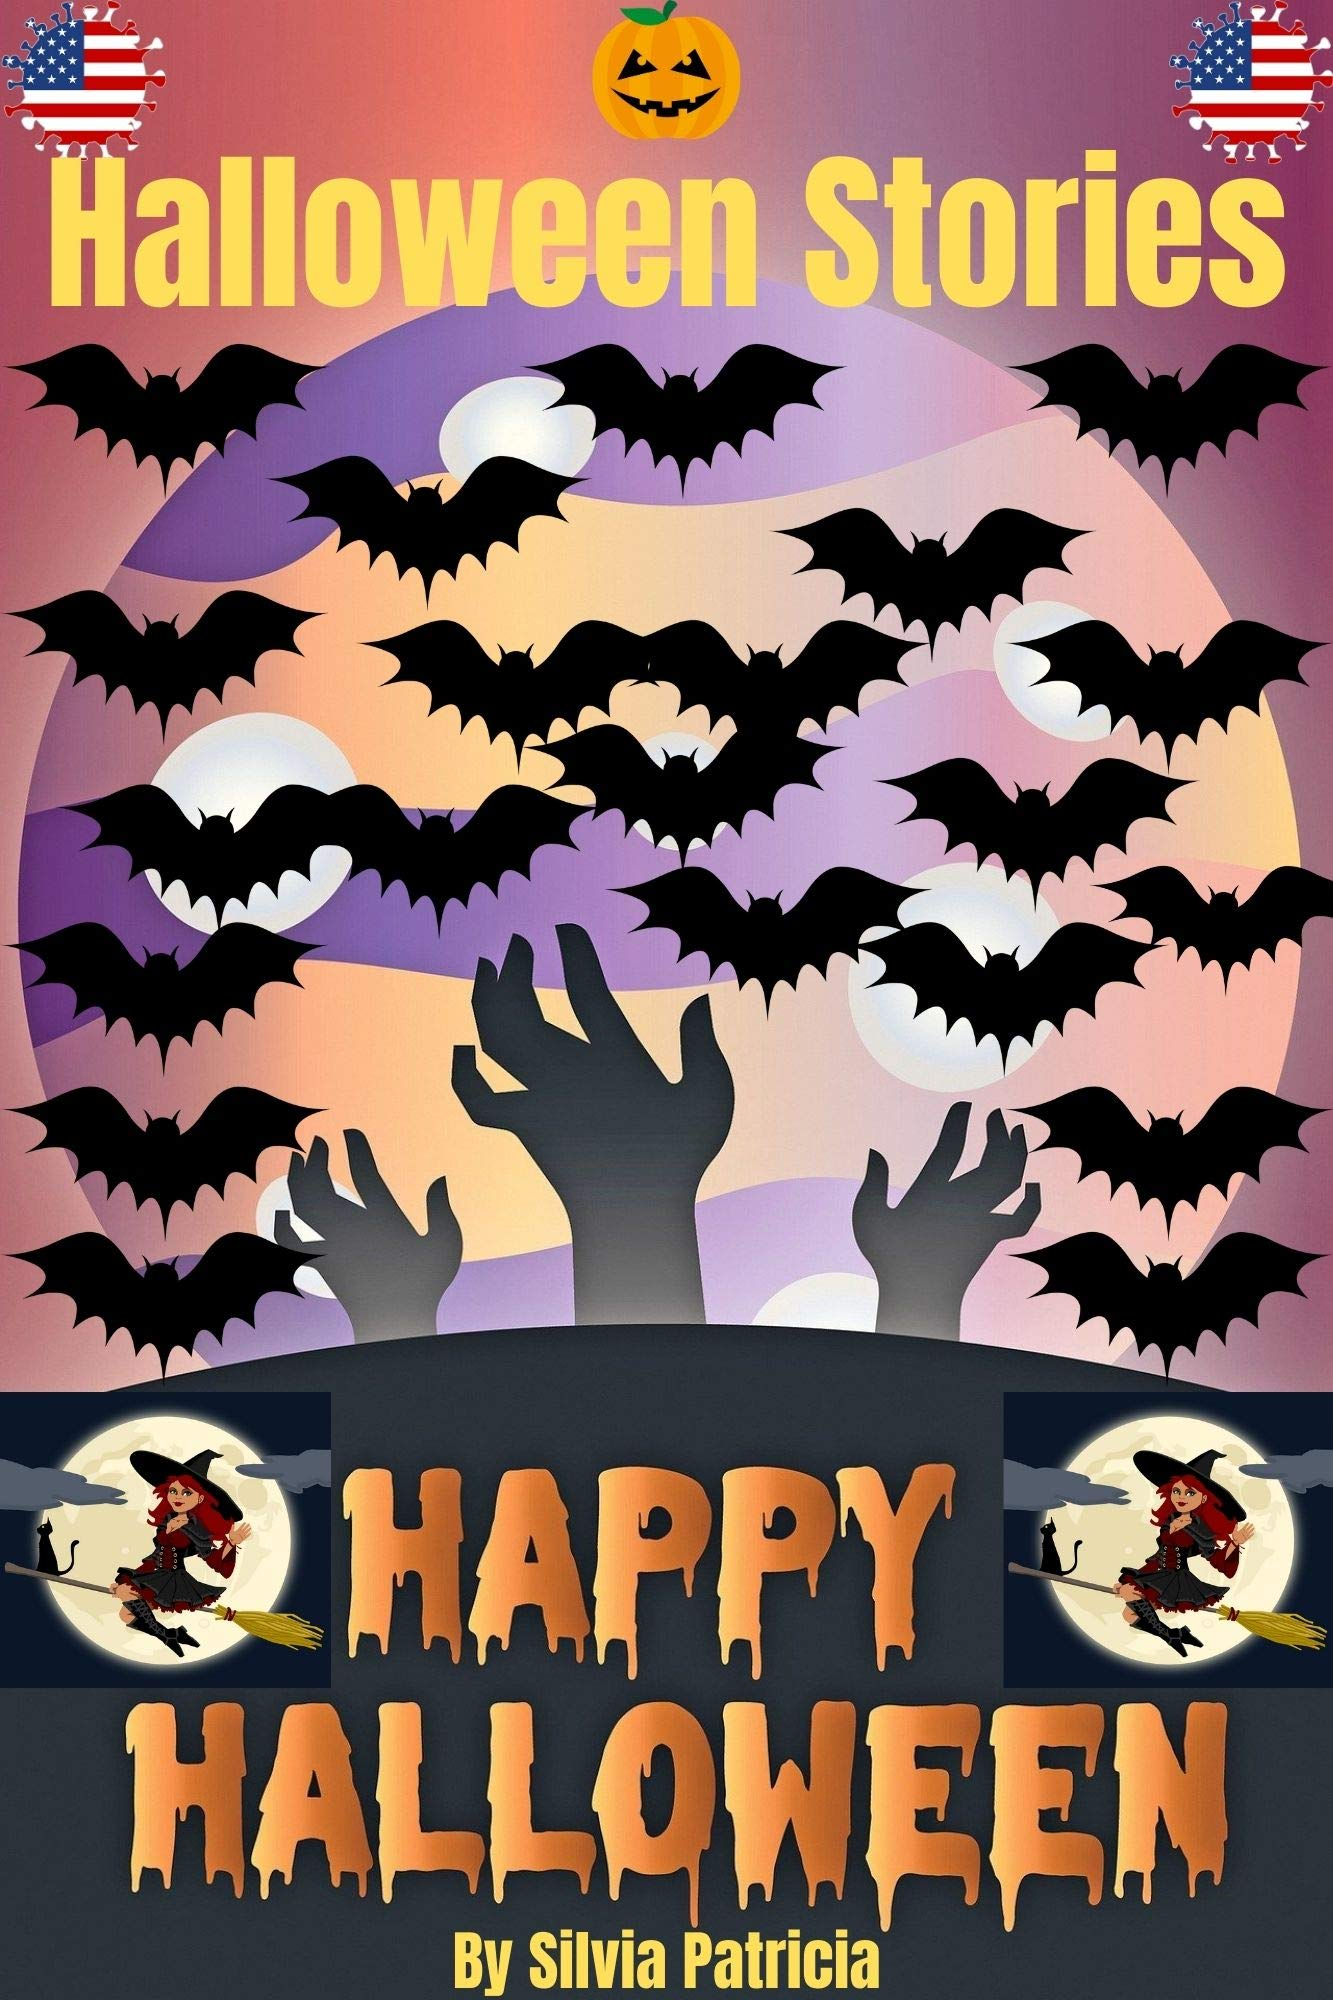 Halloween Stories: Spooky Short Stories for Kids (Halloween Collection Book 7